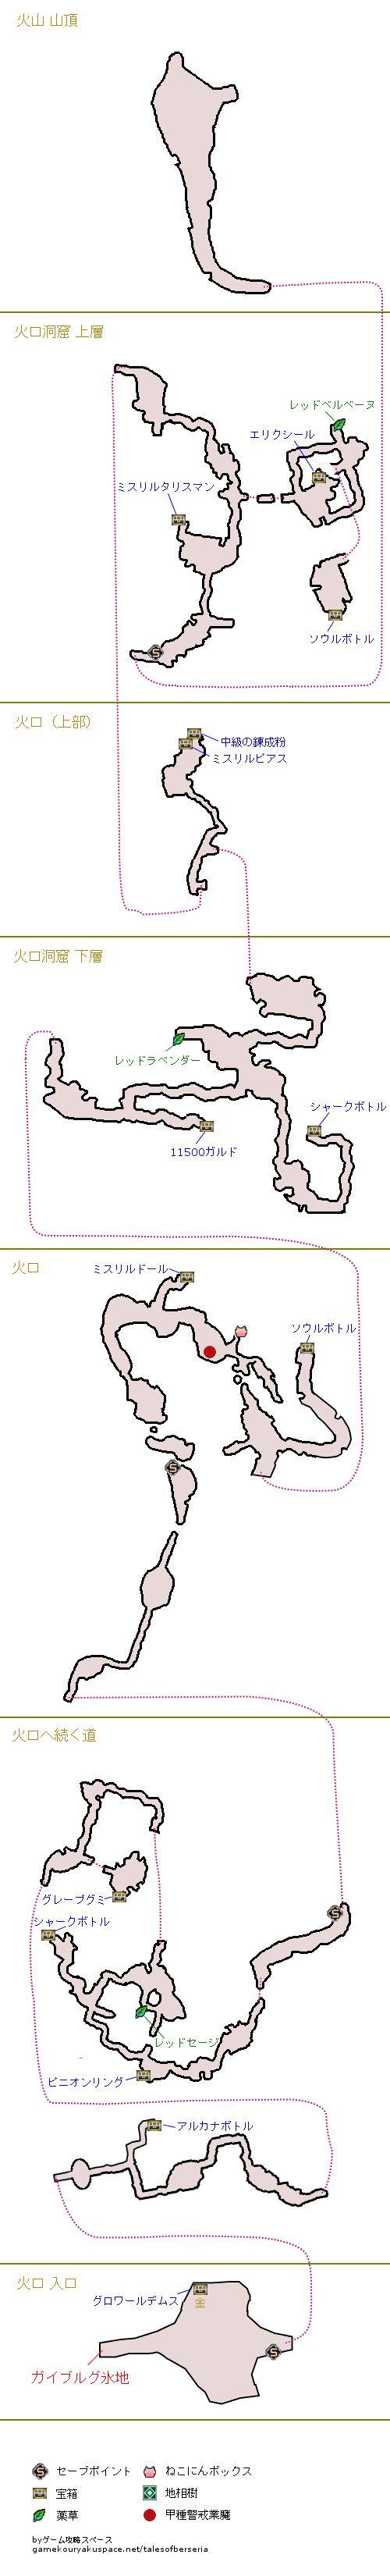 TOB 大地脈湧点 キララウス火山 攻略マップ